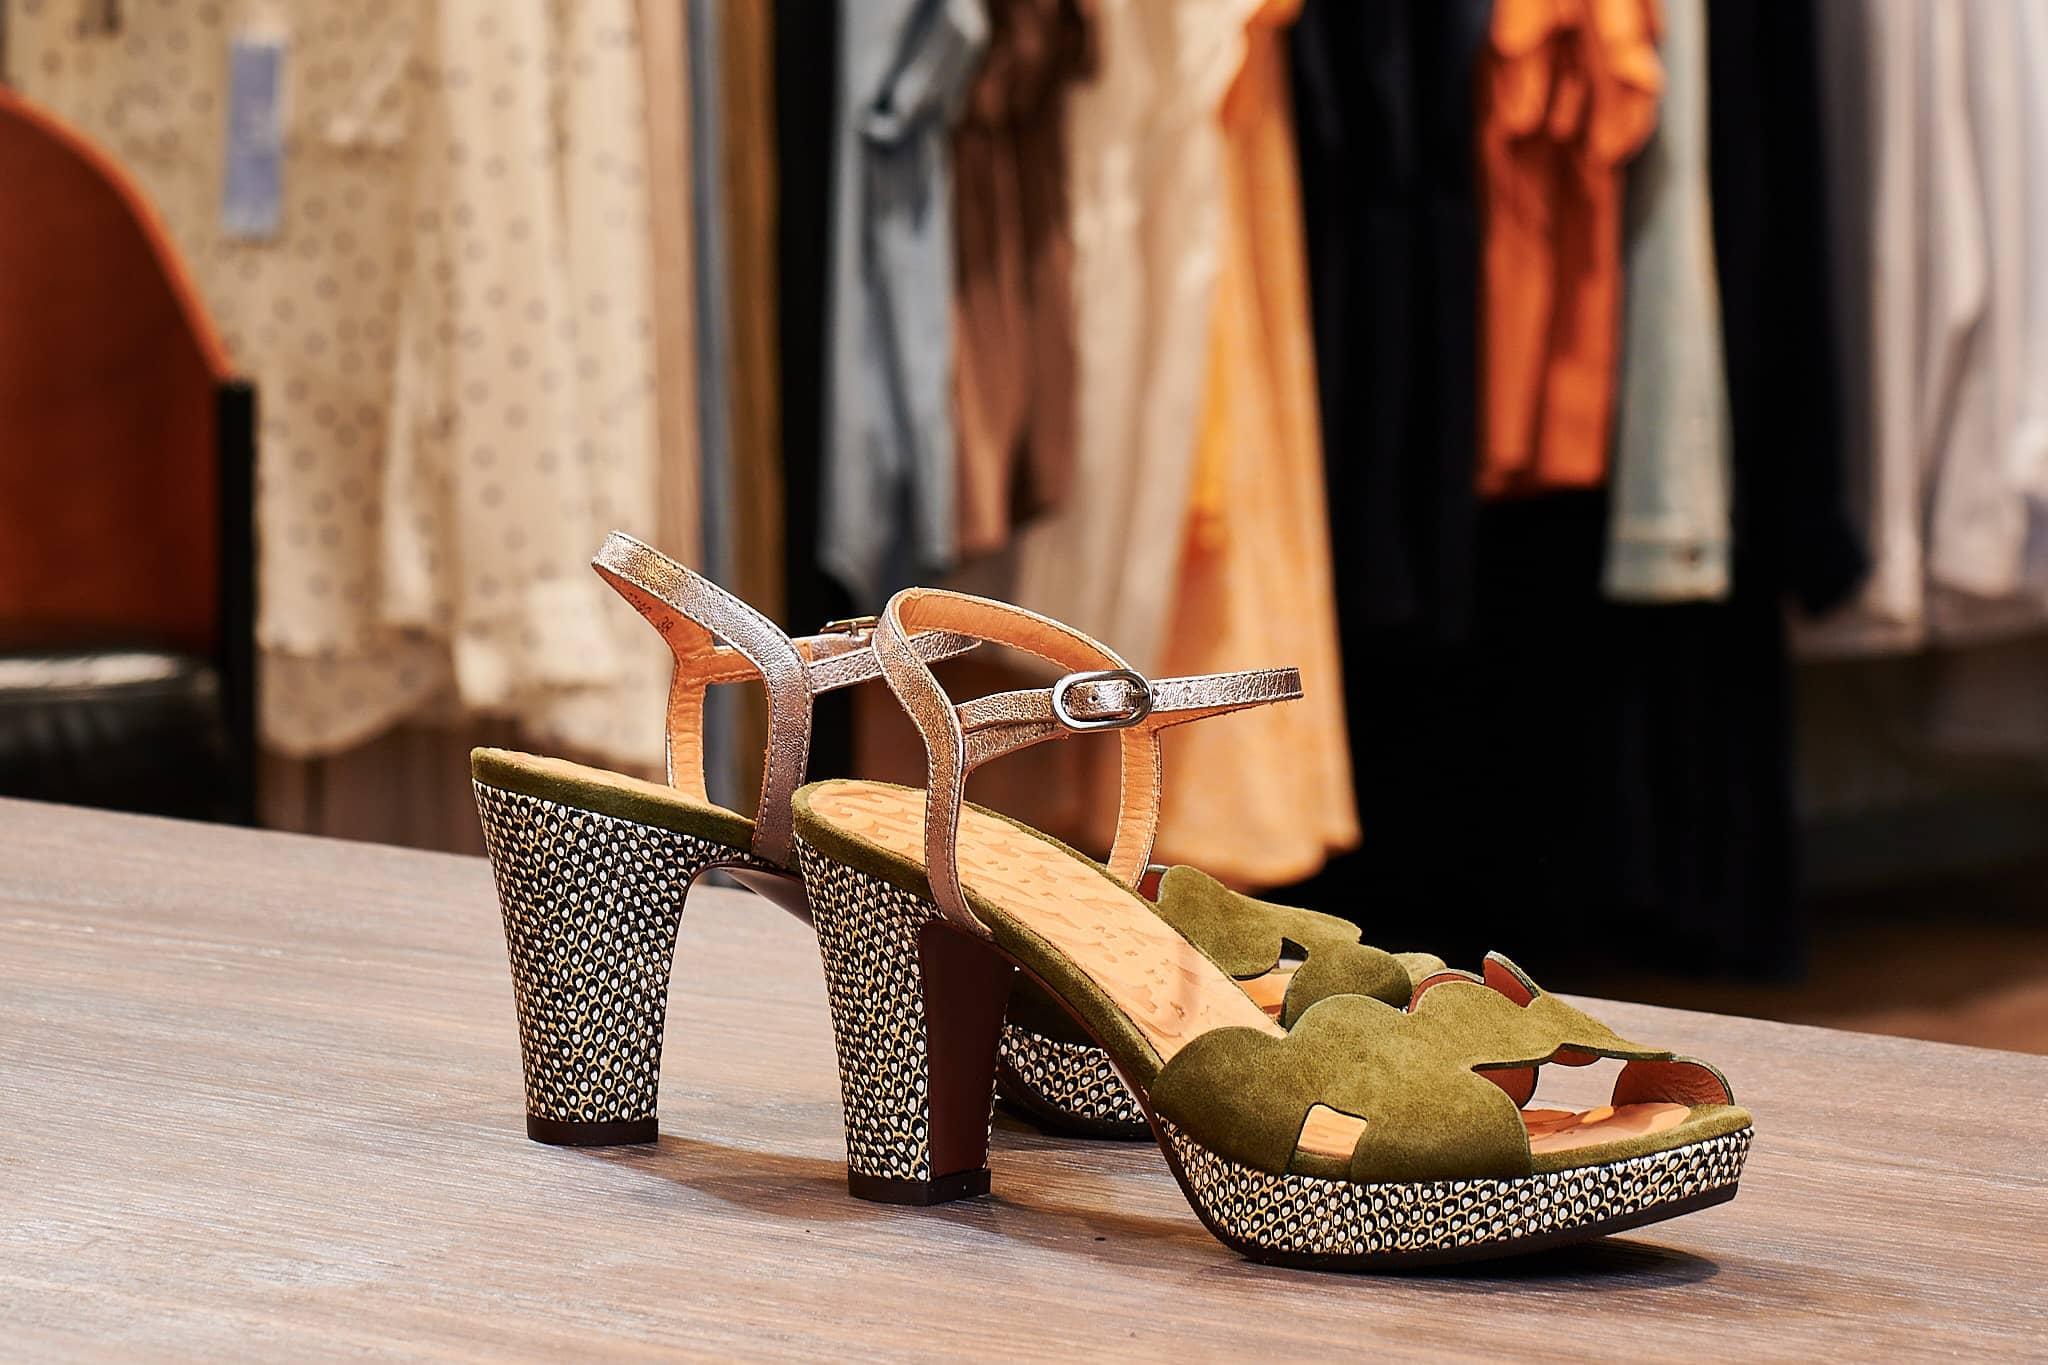 Chie Mihara Sandalette Grün